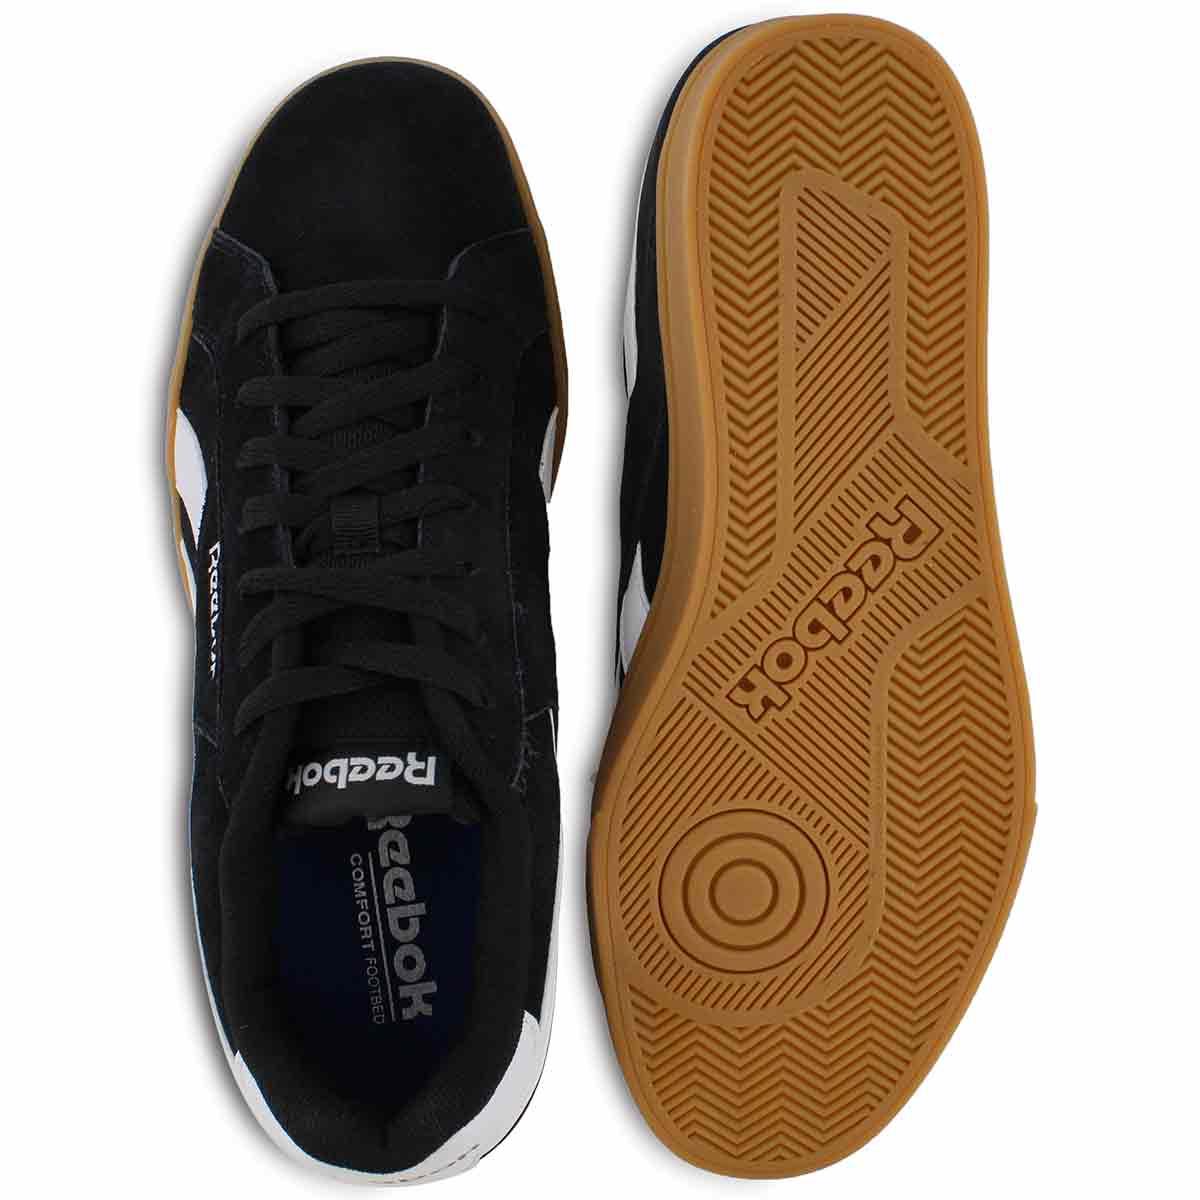 Men's ROYAL COMPLETE 3 LOW blk/wht sneakers